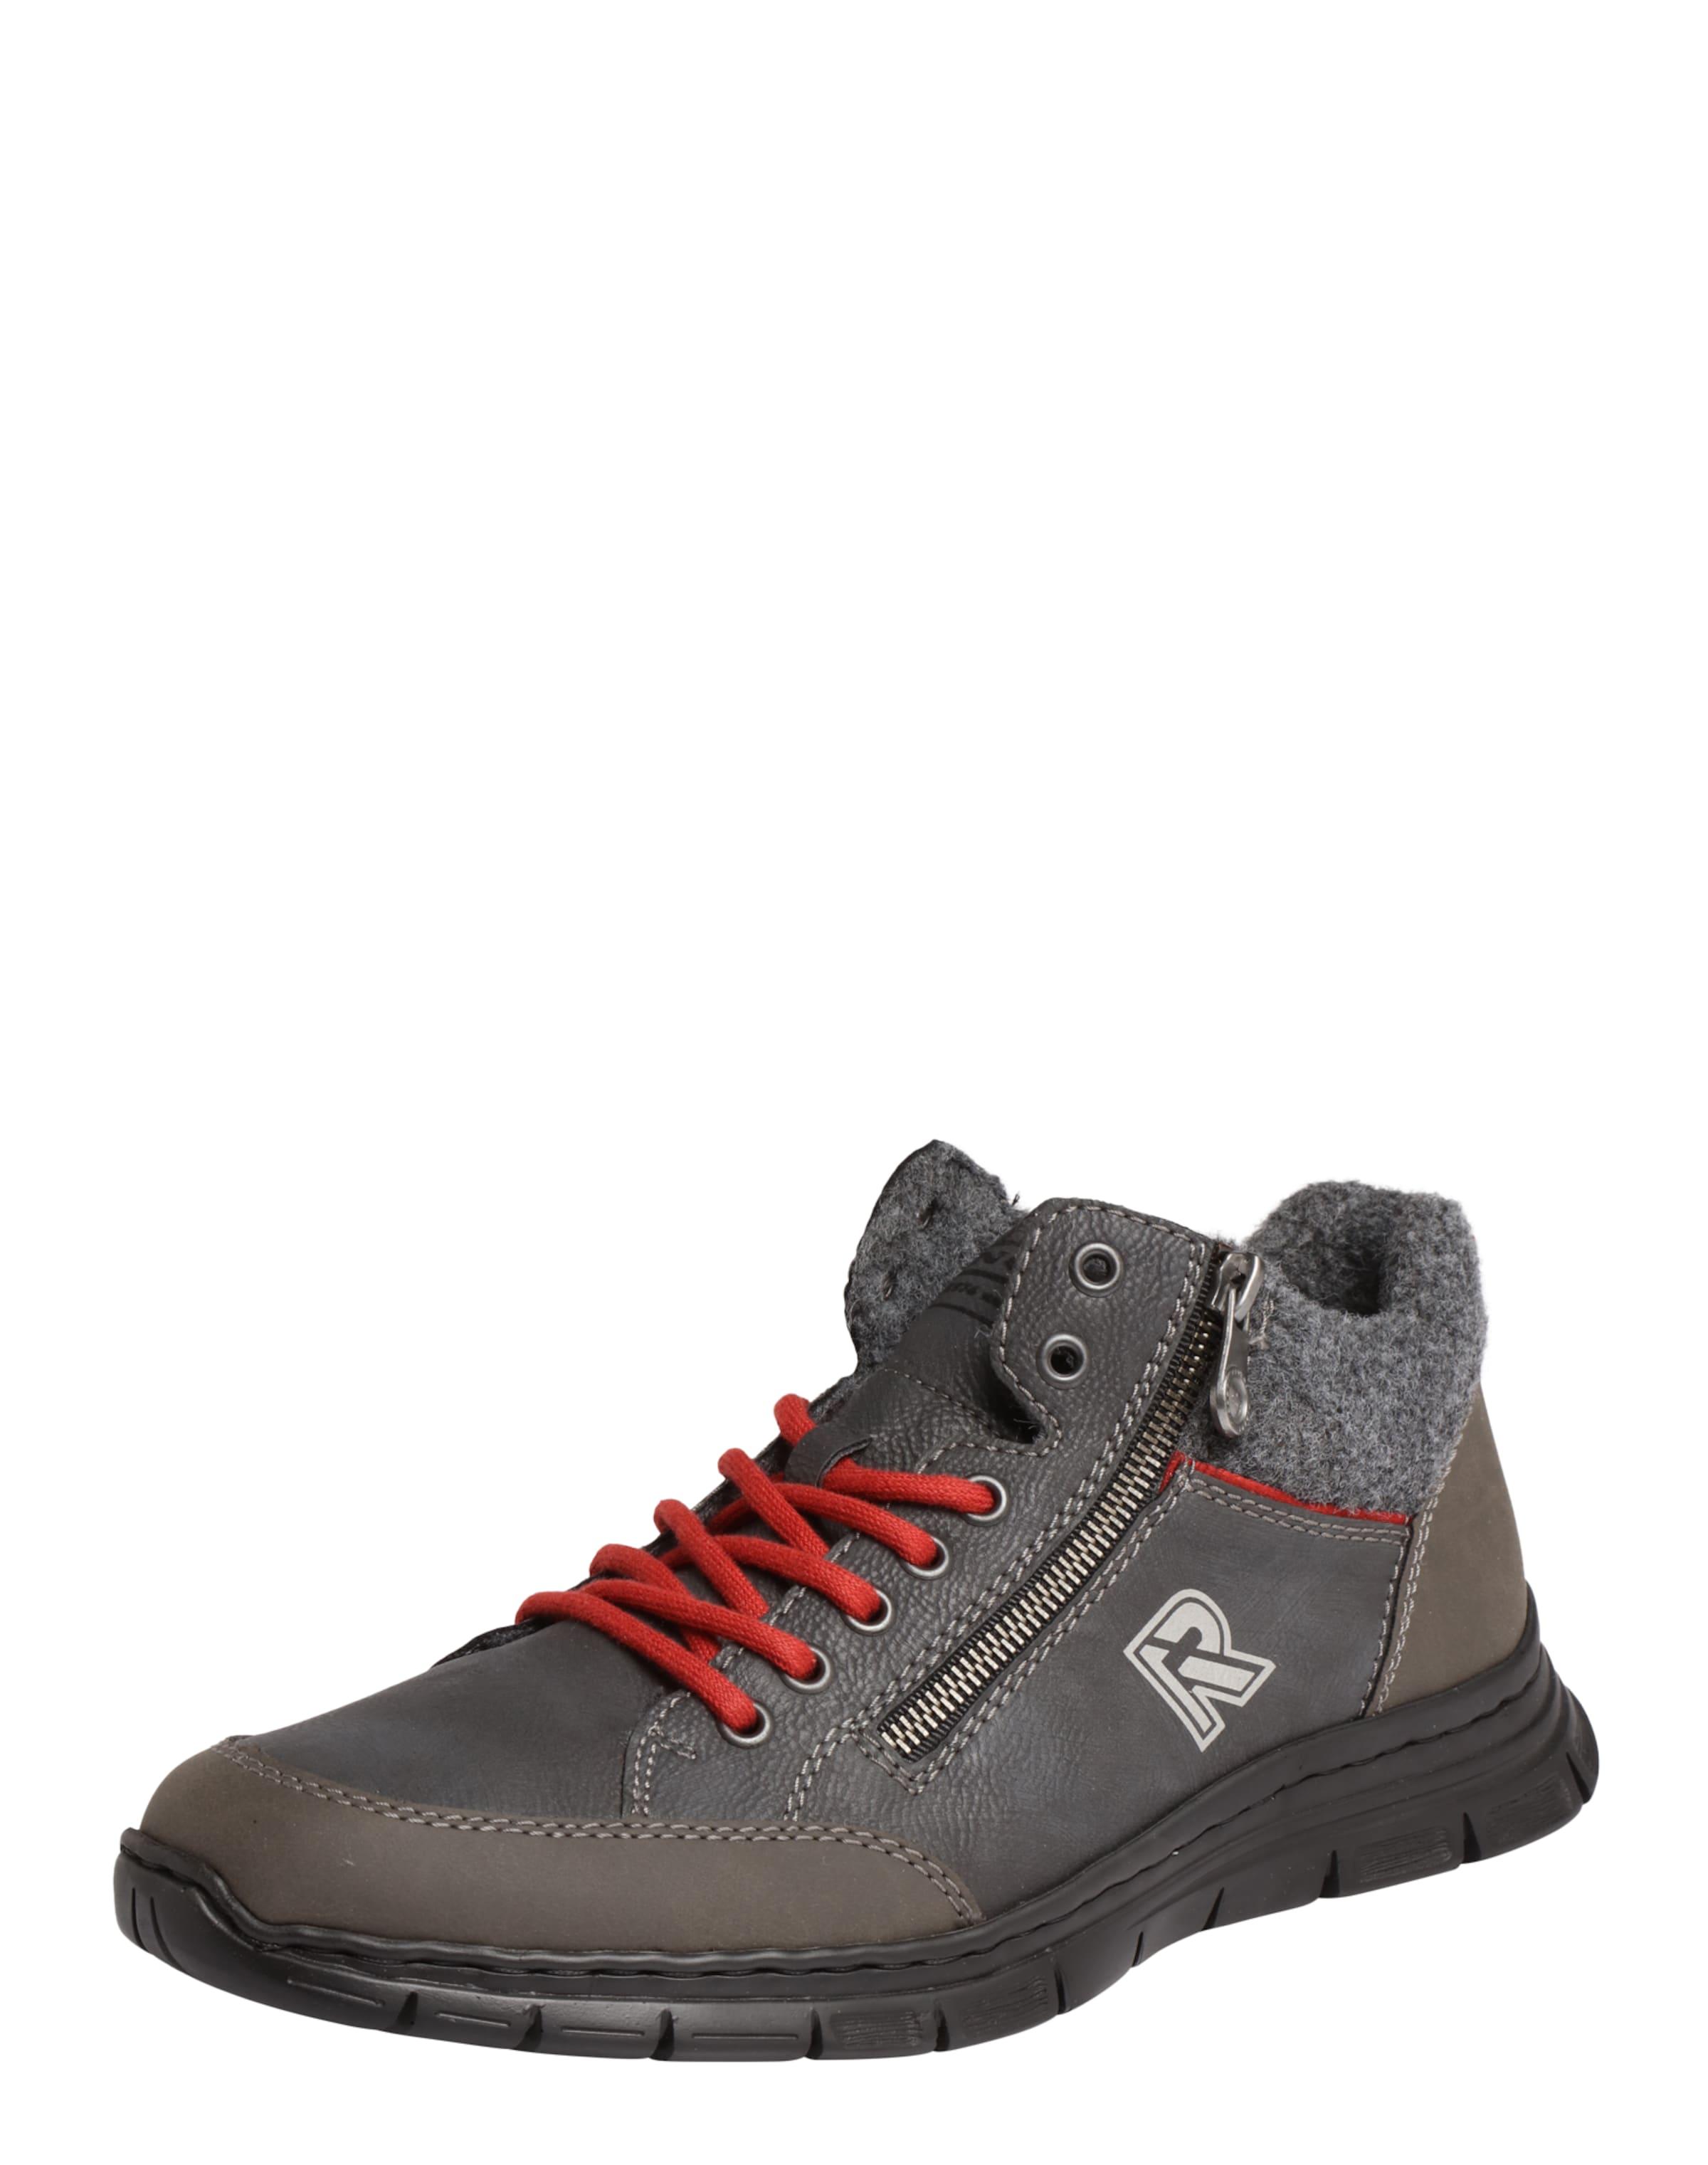 RIEKER Sneaker im Materialmix Verschleißfeste billige Schuhe